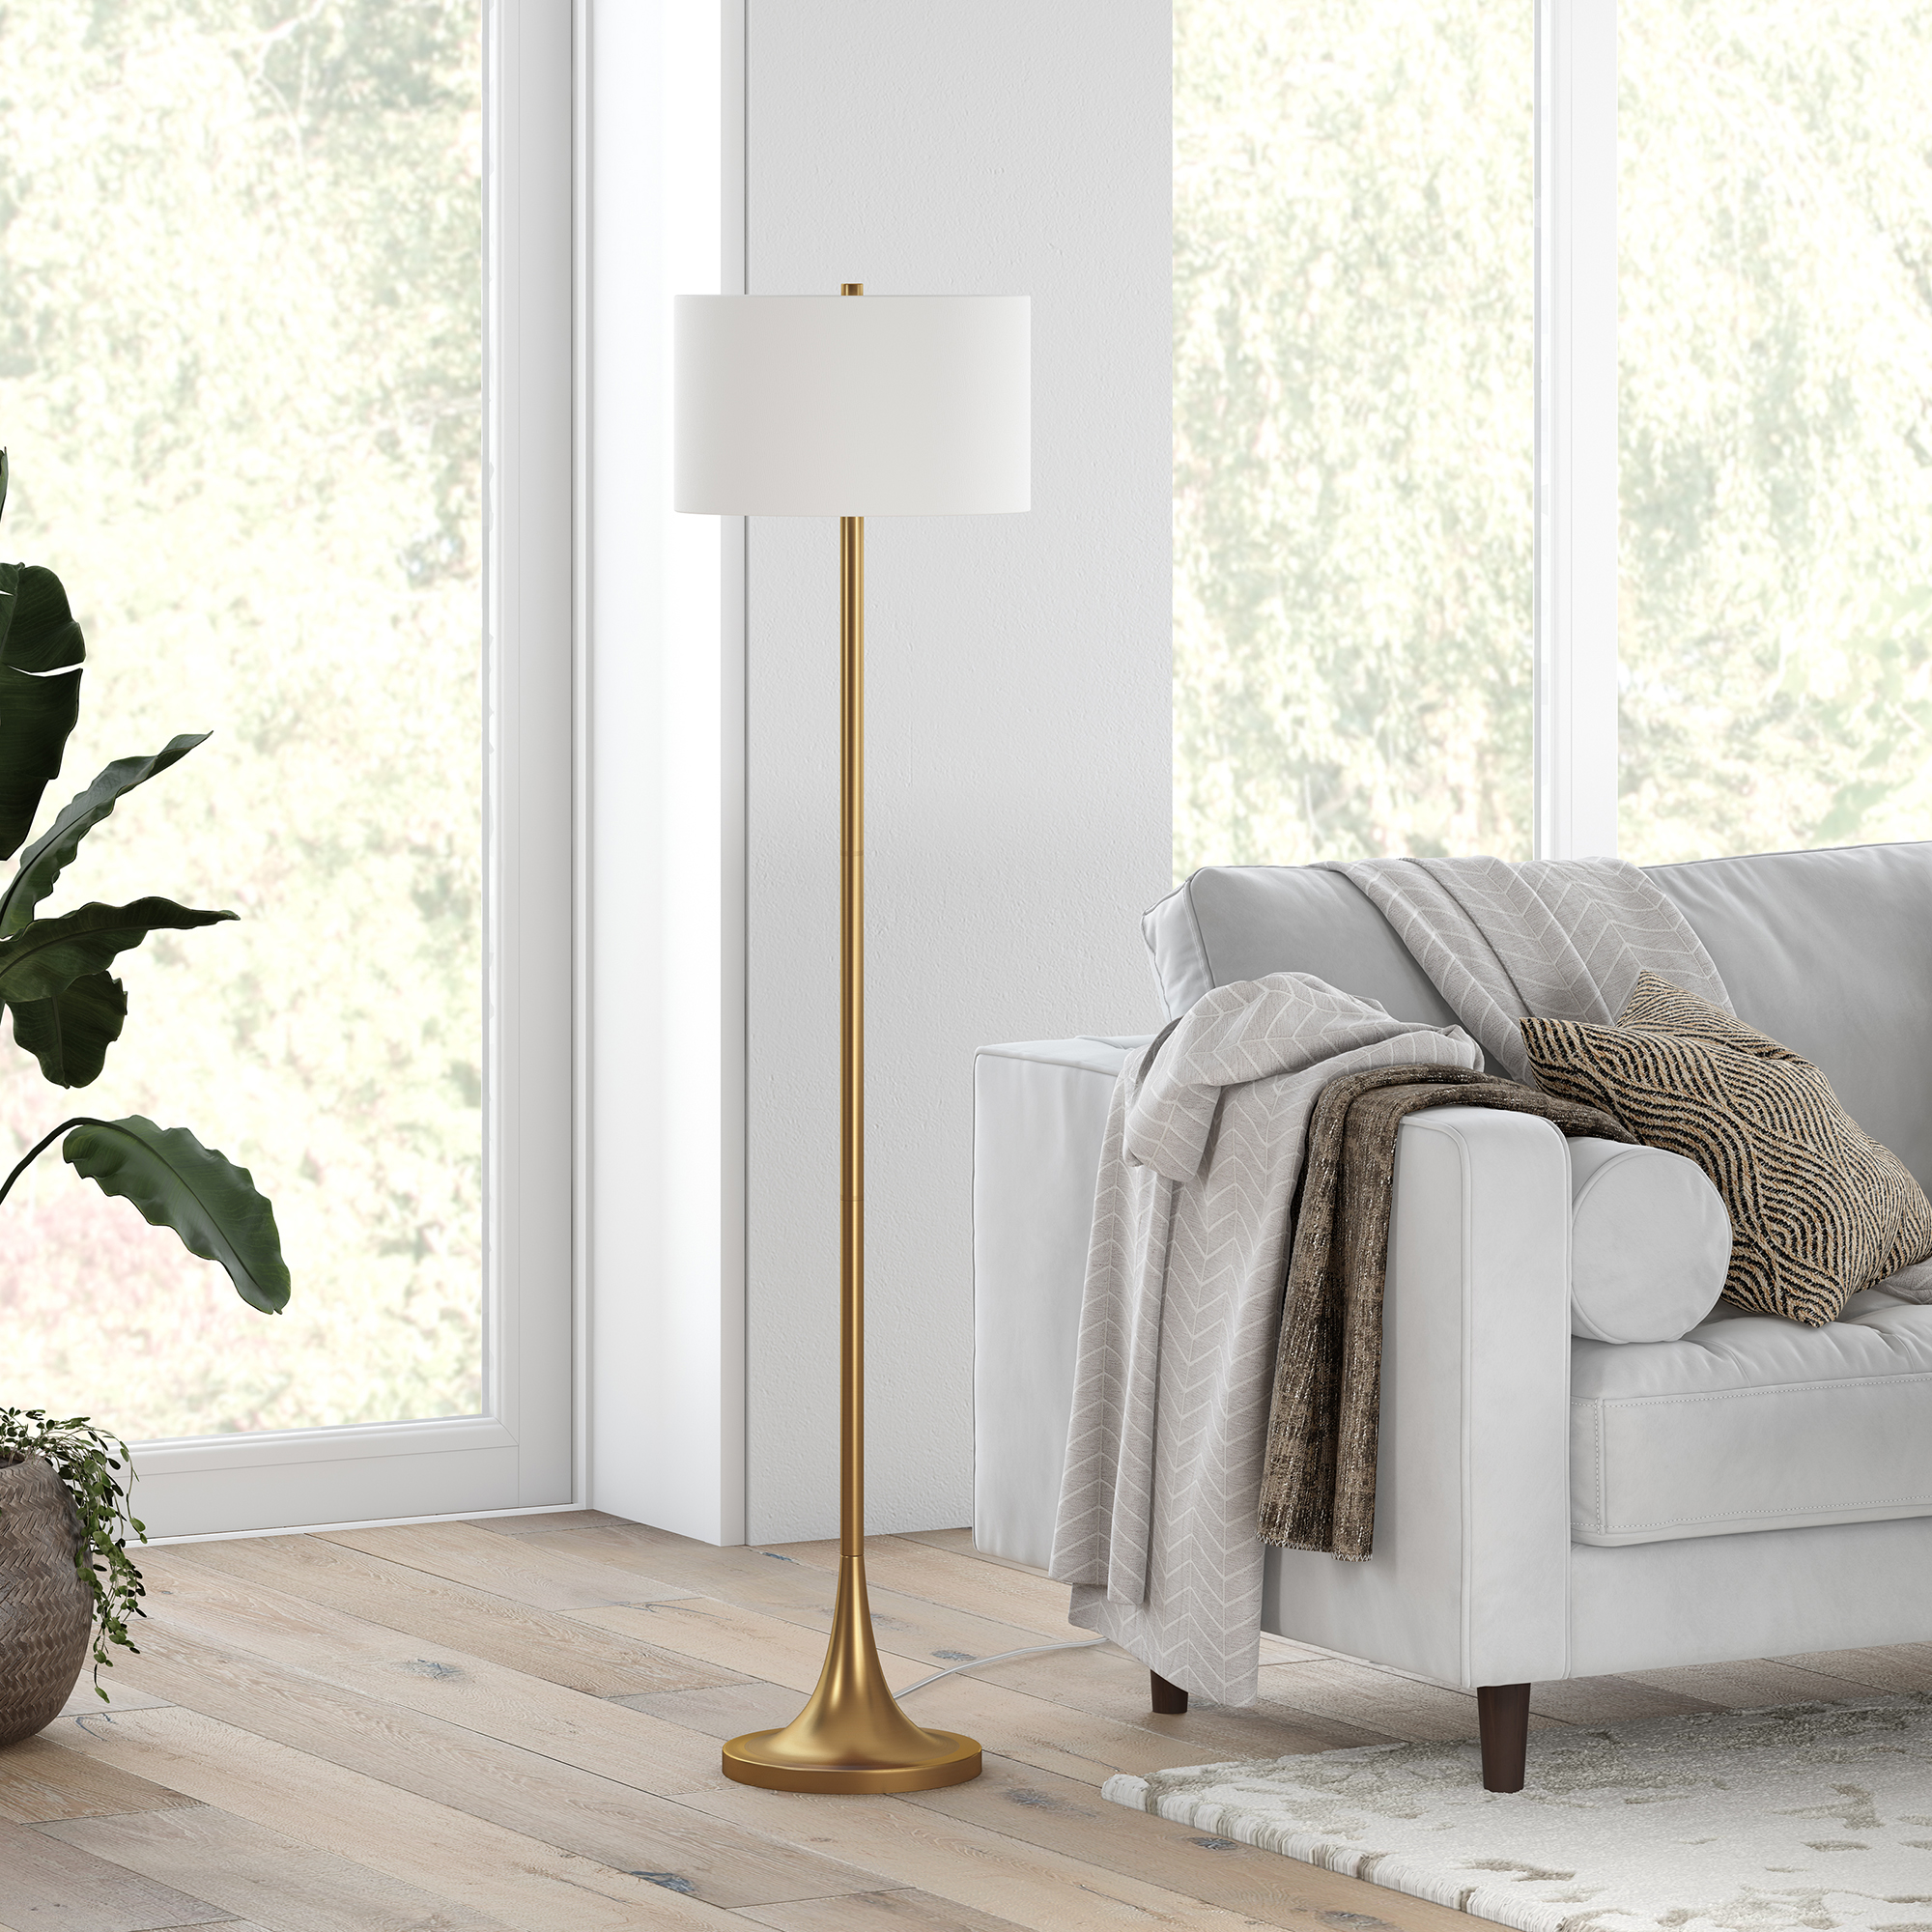 Josephine Floor Lamp in Brass